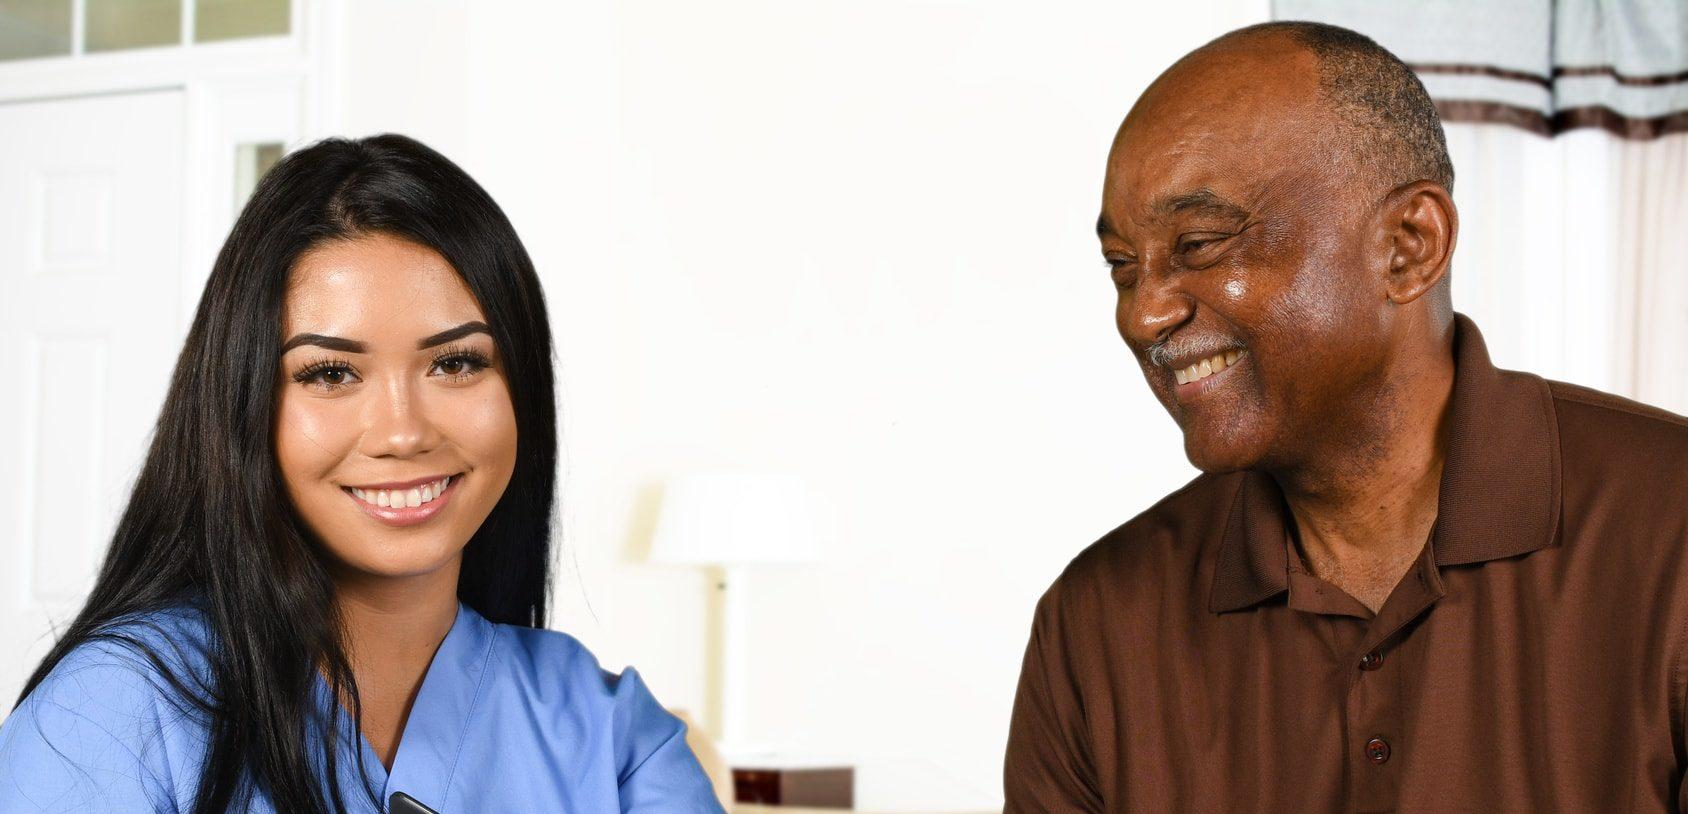 senior care services agency in long island city, nassau county, ny